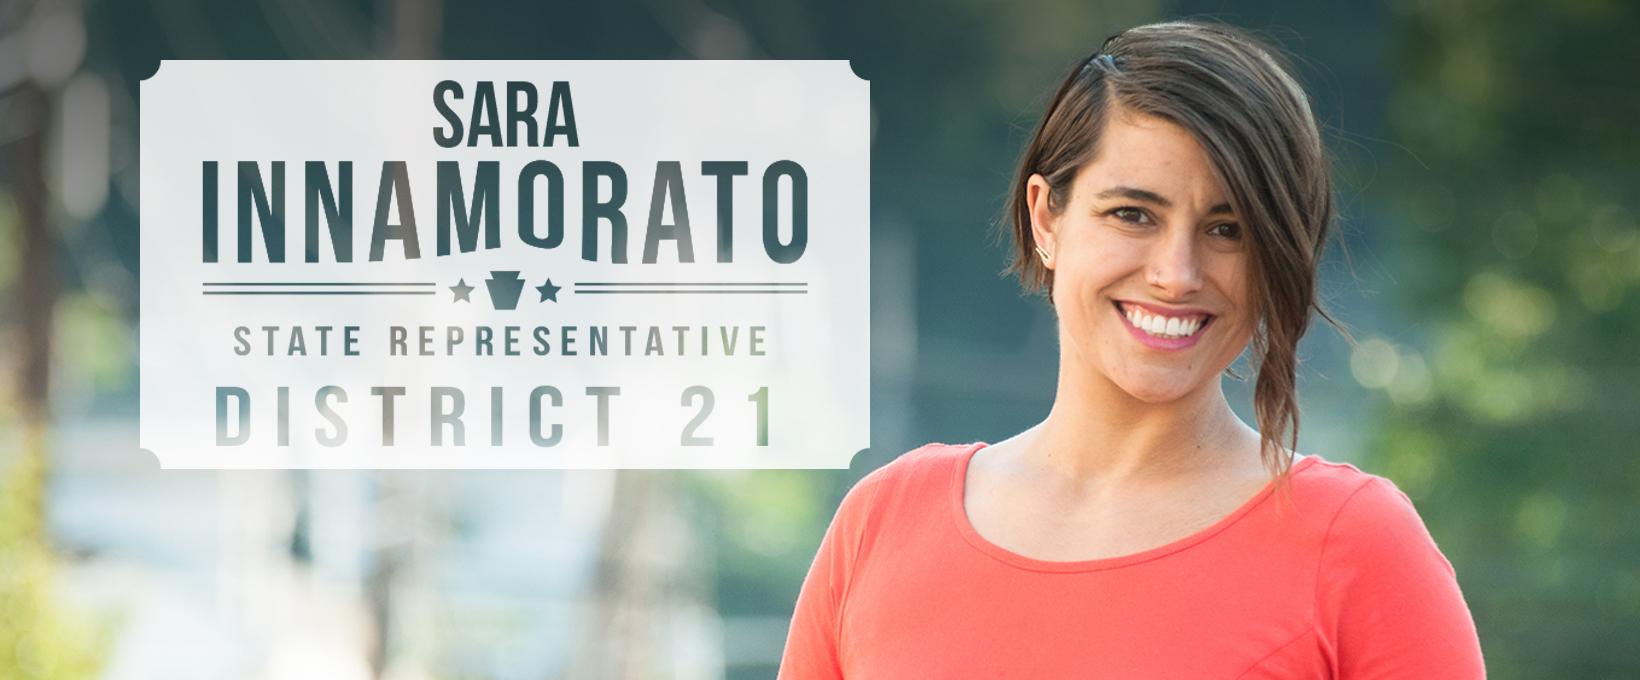 Logo for Sara Innamorato's bid for Pennsylvania State Rep in the 21st District.